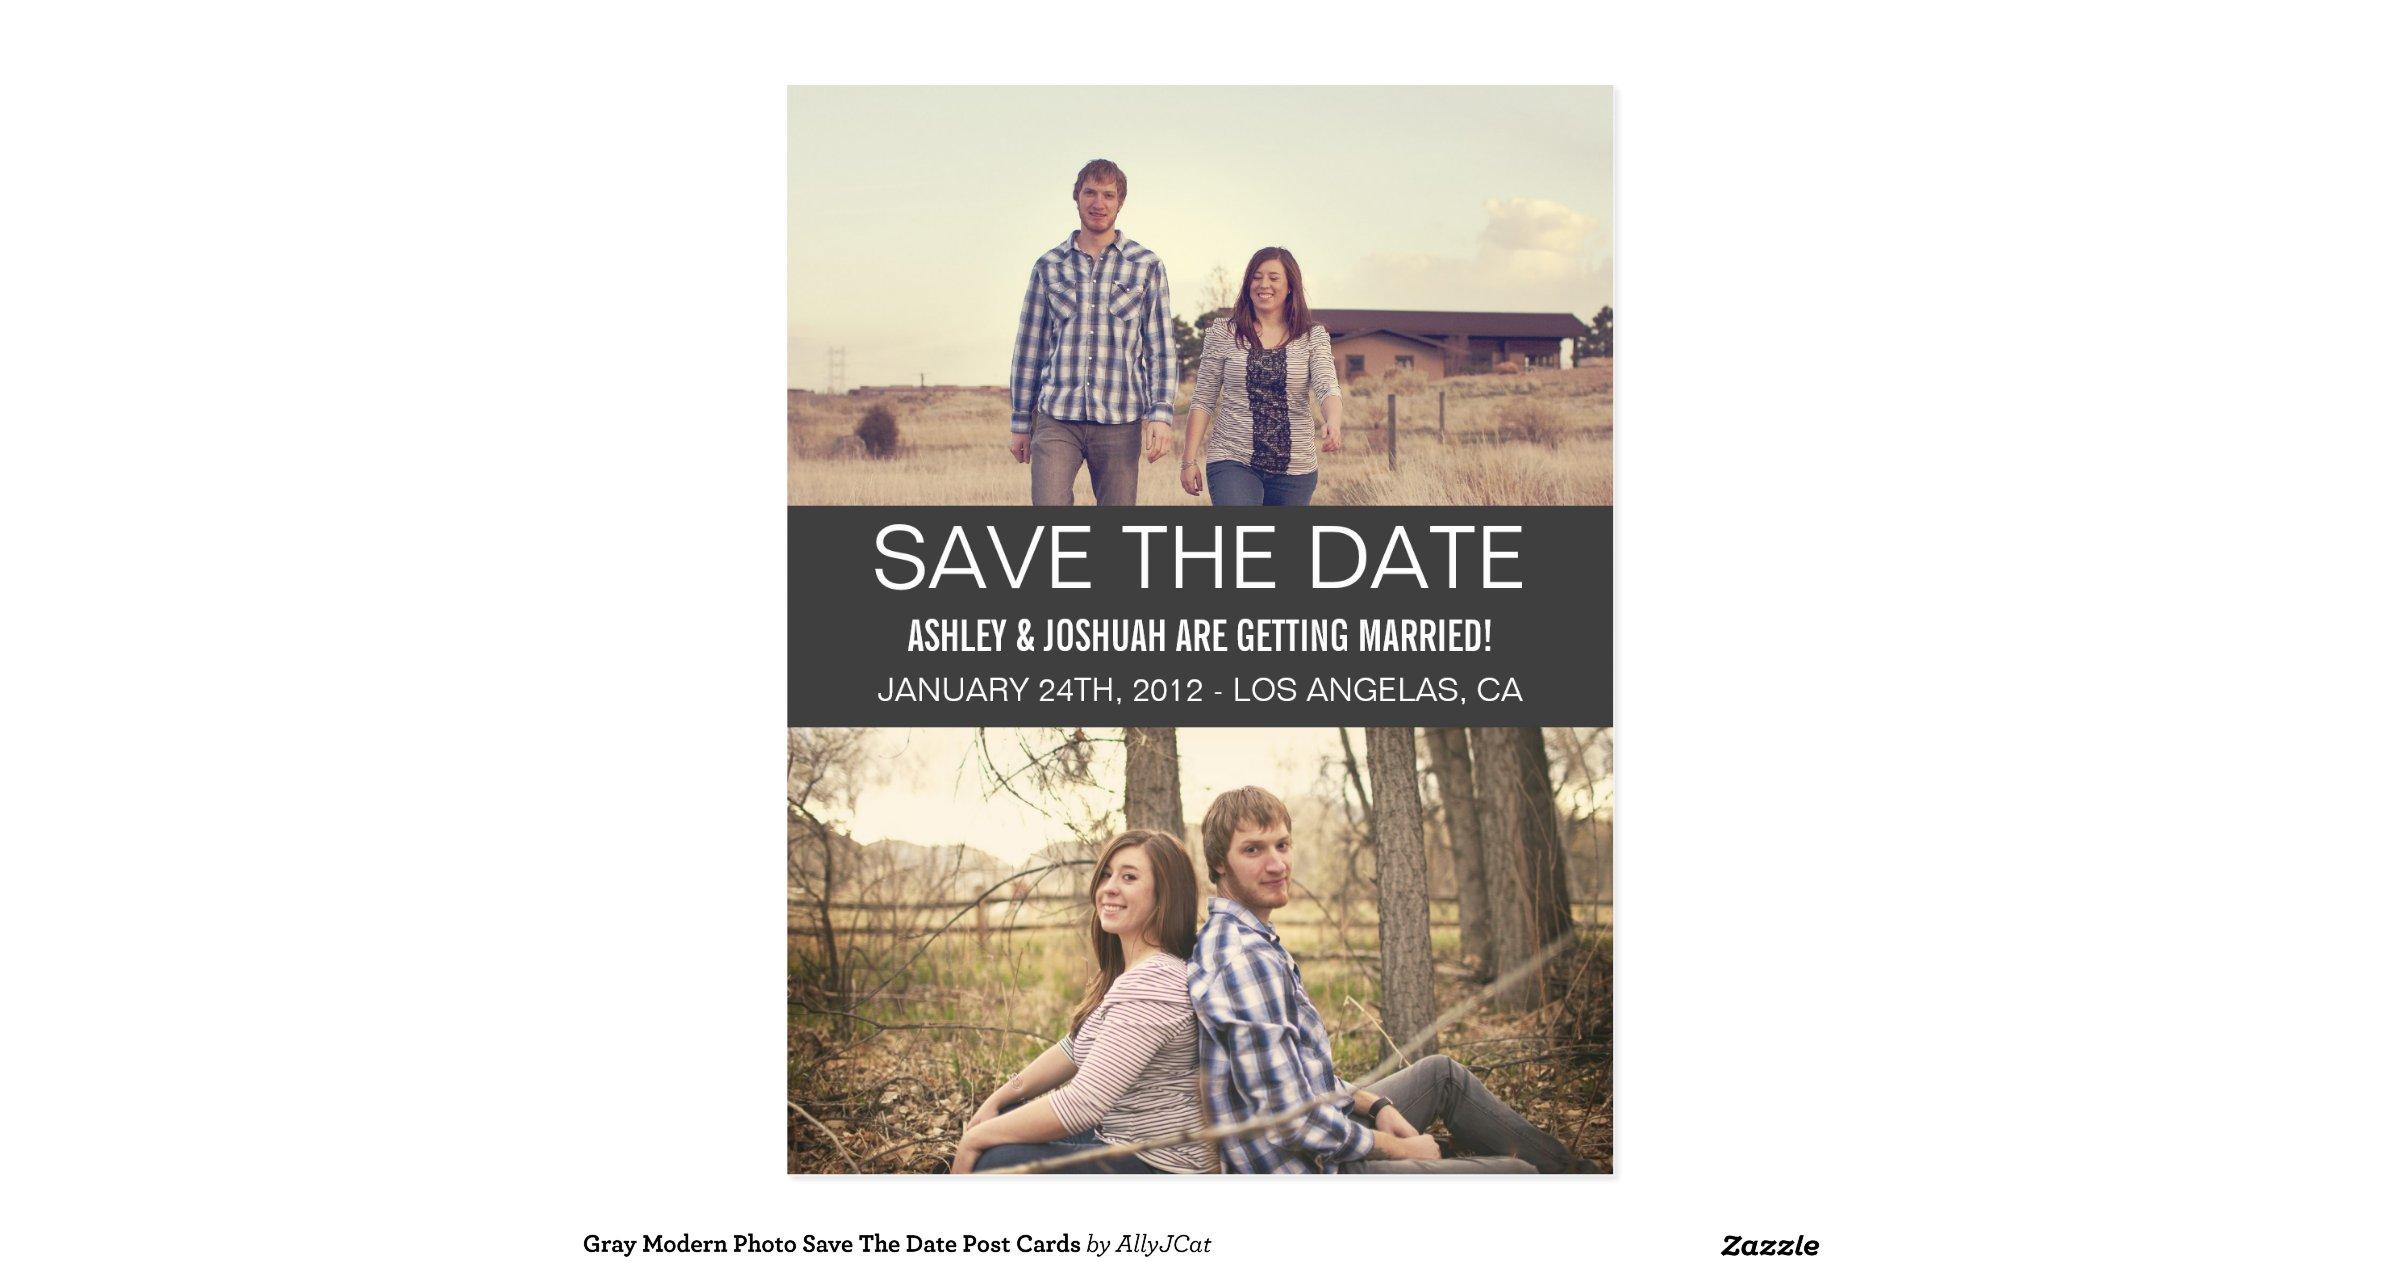 gray modern photo save the date post cards r3ca806b1b29949c1943bee86cbb89858 vgbaq 8byvr 1200